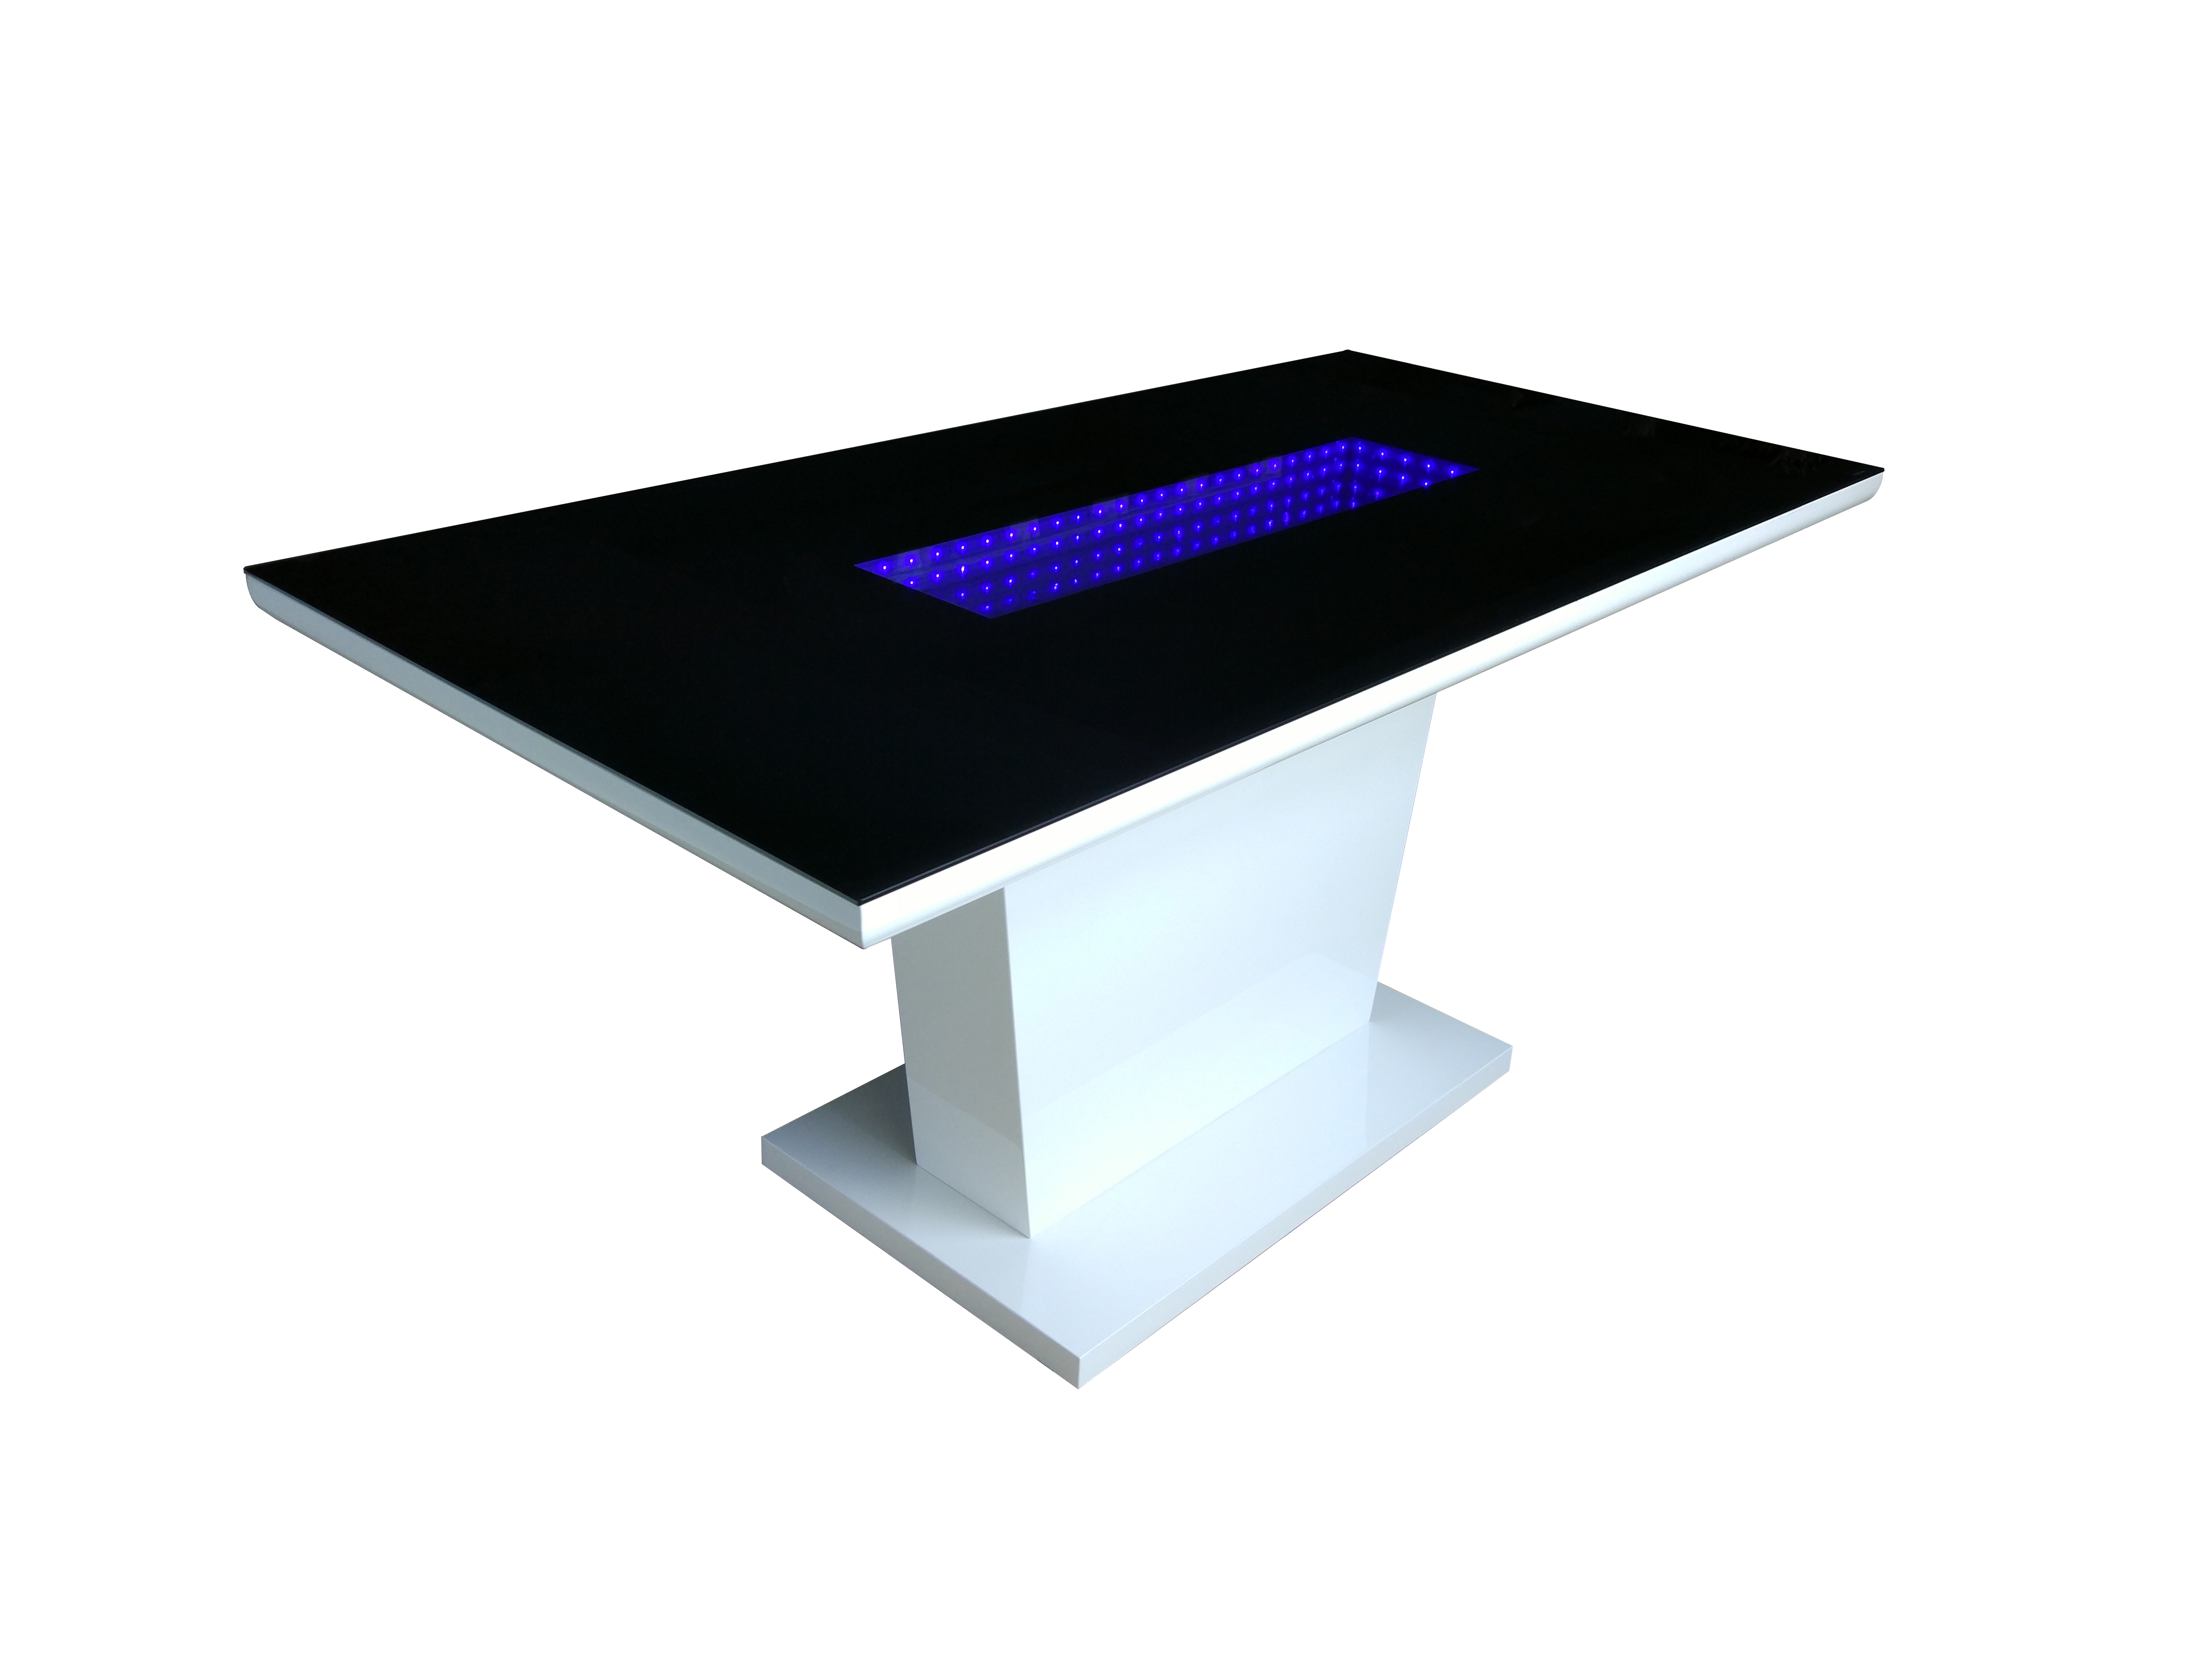 Matrix High Gloss Dining Table White amp Black Gloss with  : Matrix20dining20table from www.ebay.co.uk size 4608 x 3456 jpeg 2087kB